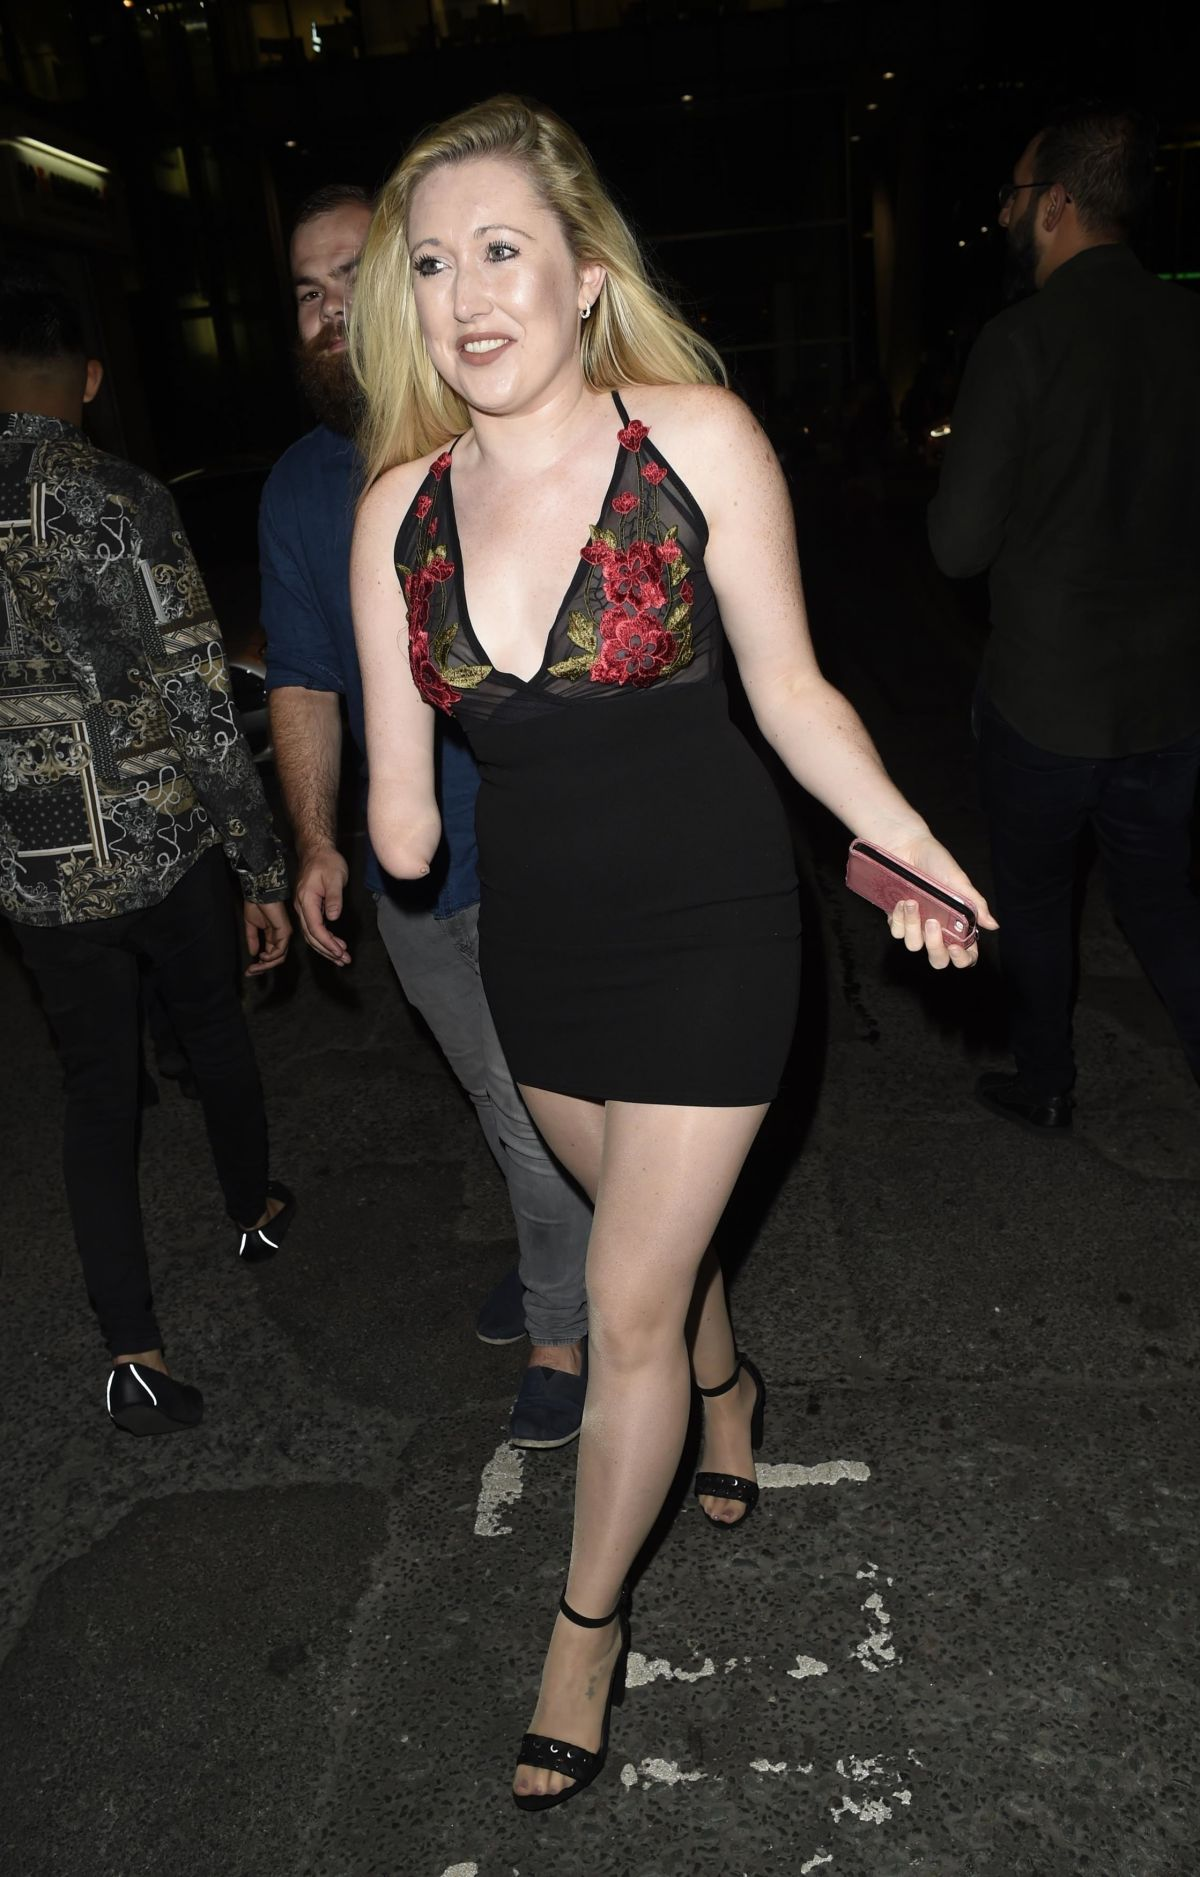 Feet Melissa Johns nude photos 2019